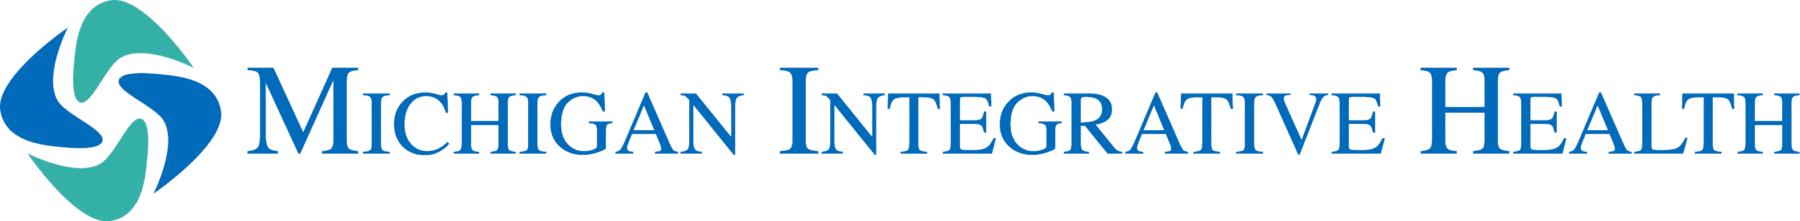 Logo Michigan Integrative Health